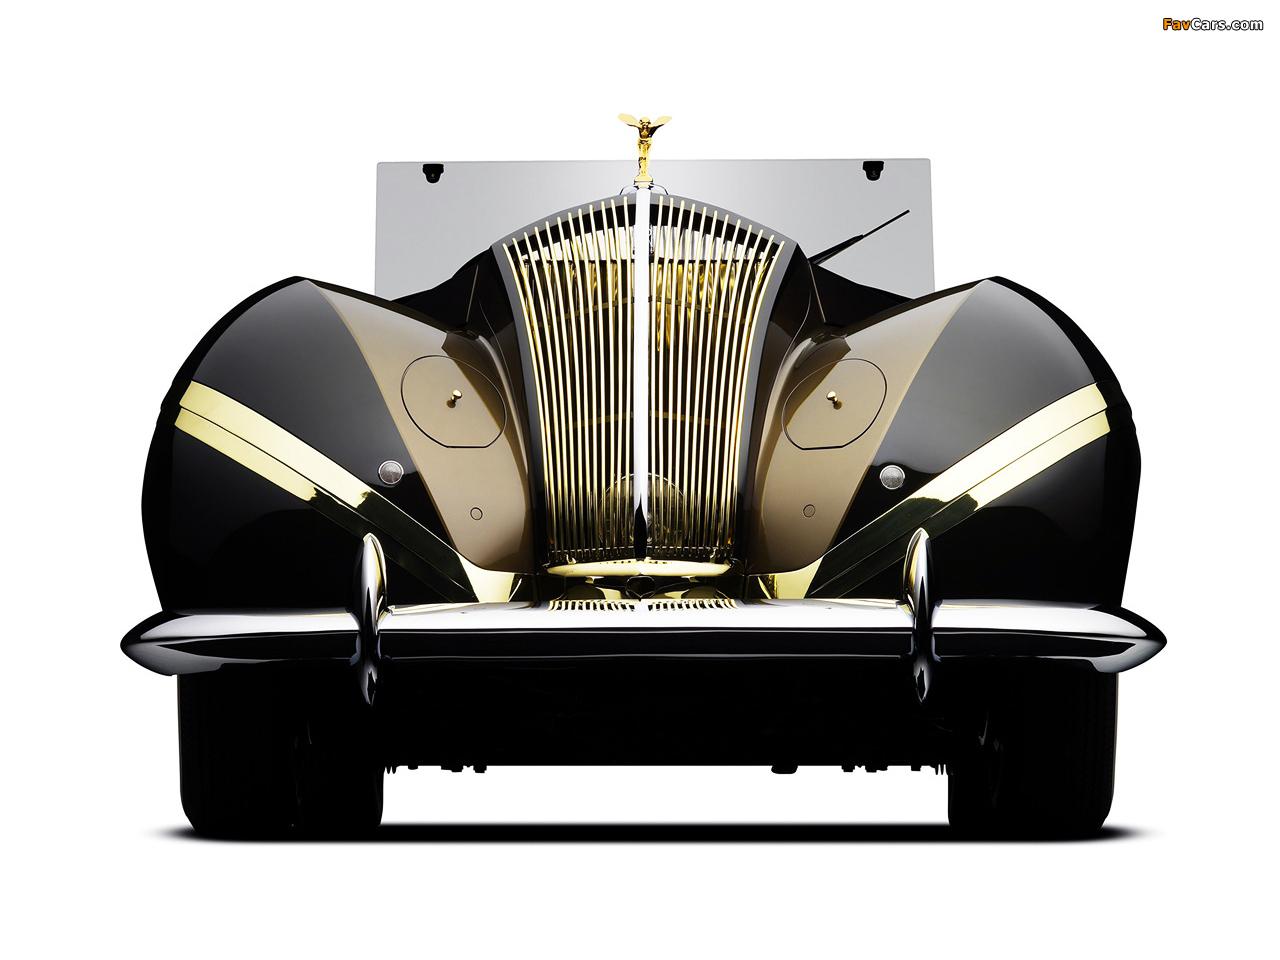 Rolls-Royce Phantom III Labourdette Vutotal Cabriolet 1947 wallpapers (1280 x 960)